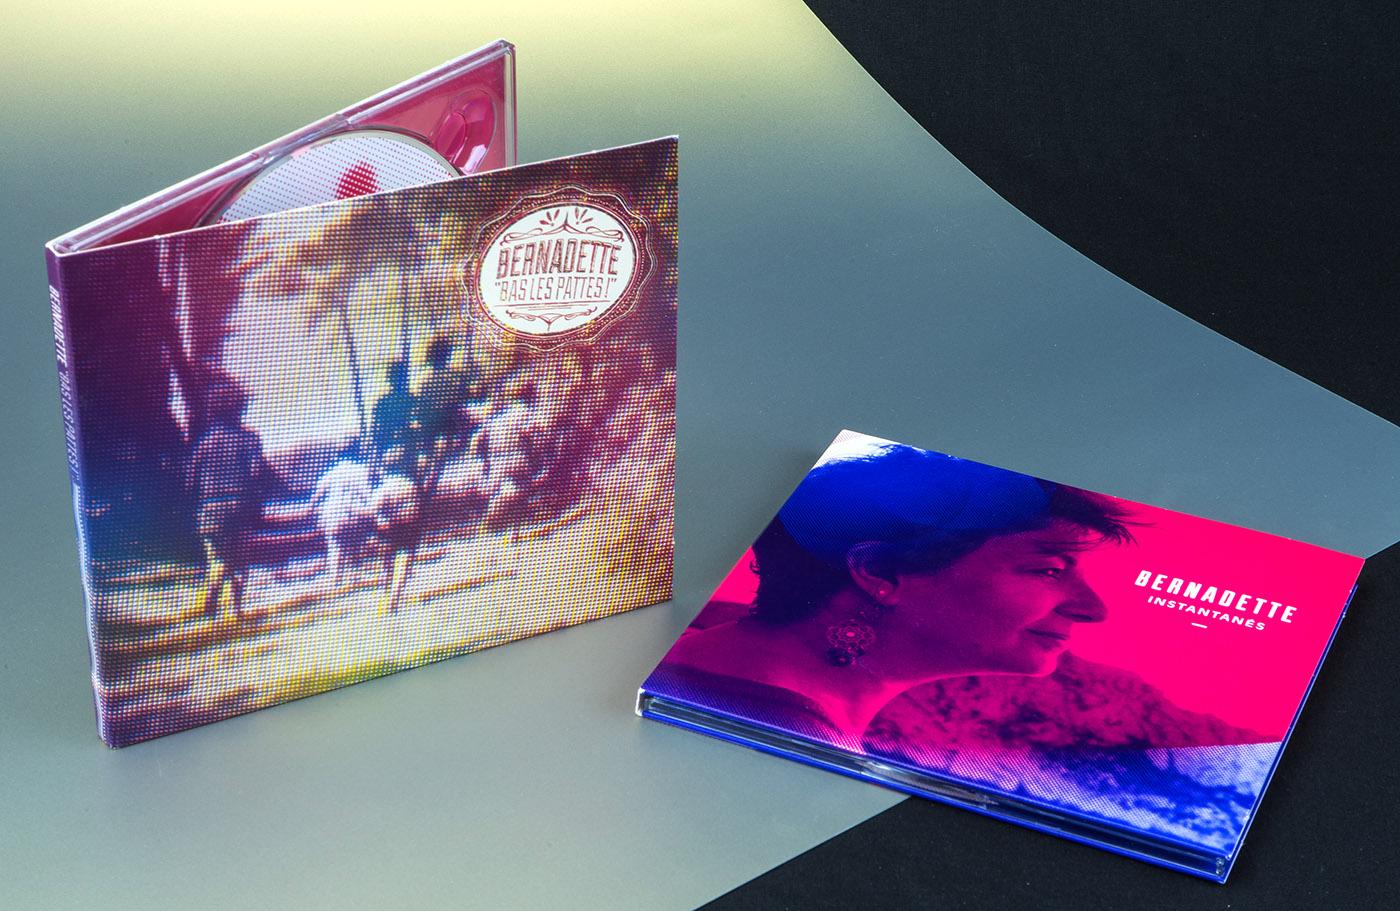 bernadette-chansons-album